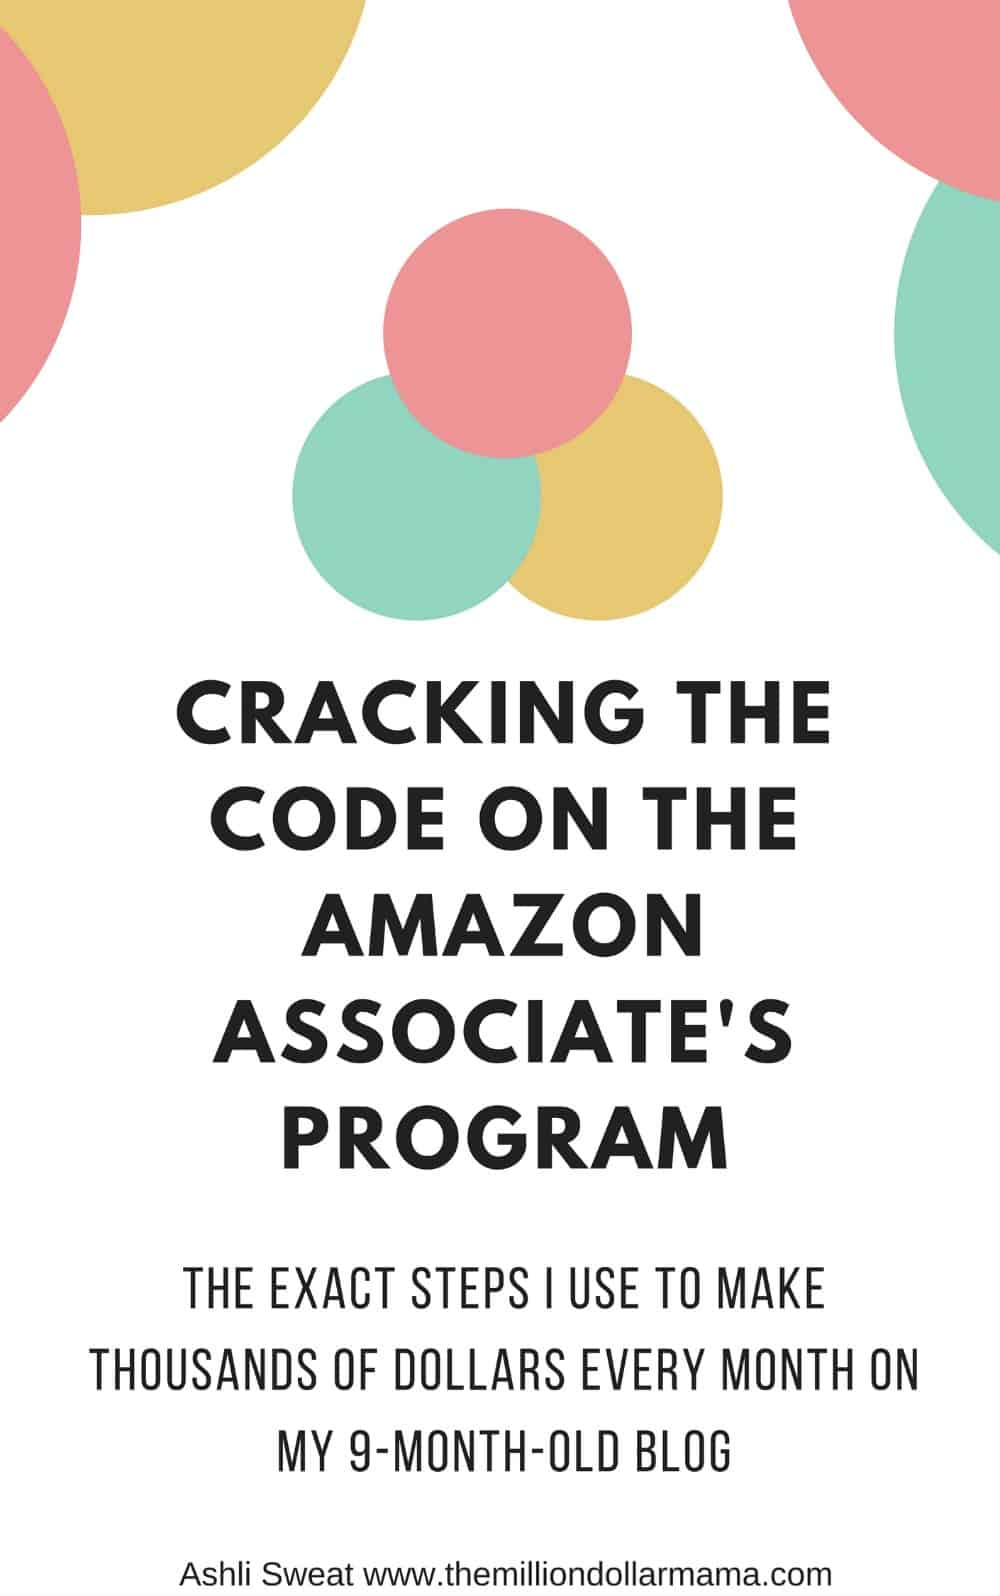 How to make money on Amazon - Cracking the Code on the Amazon Associate's Program